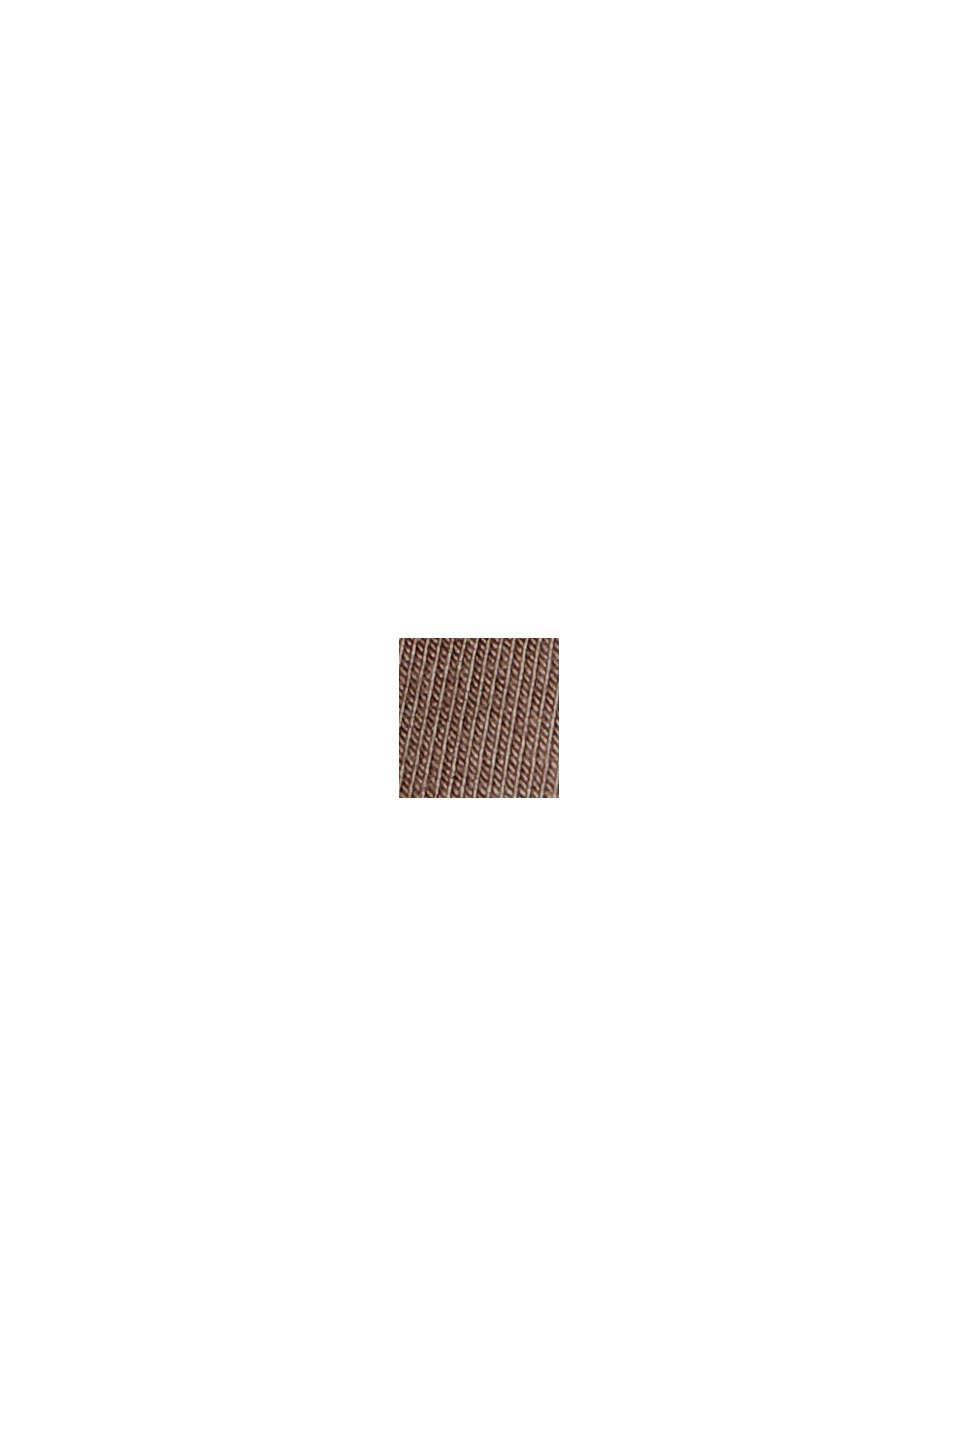 Jersey nachthemd van LENZING™ ECOVERO™, TAUPE, swatch